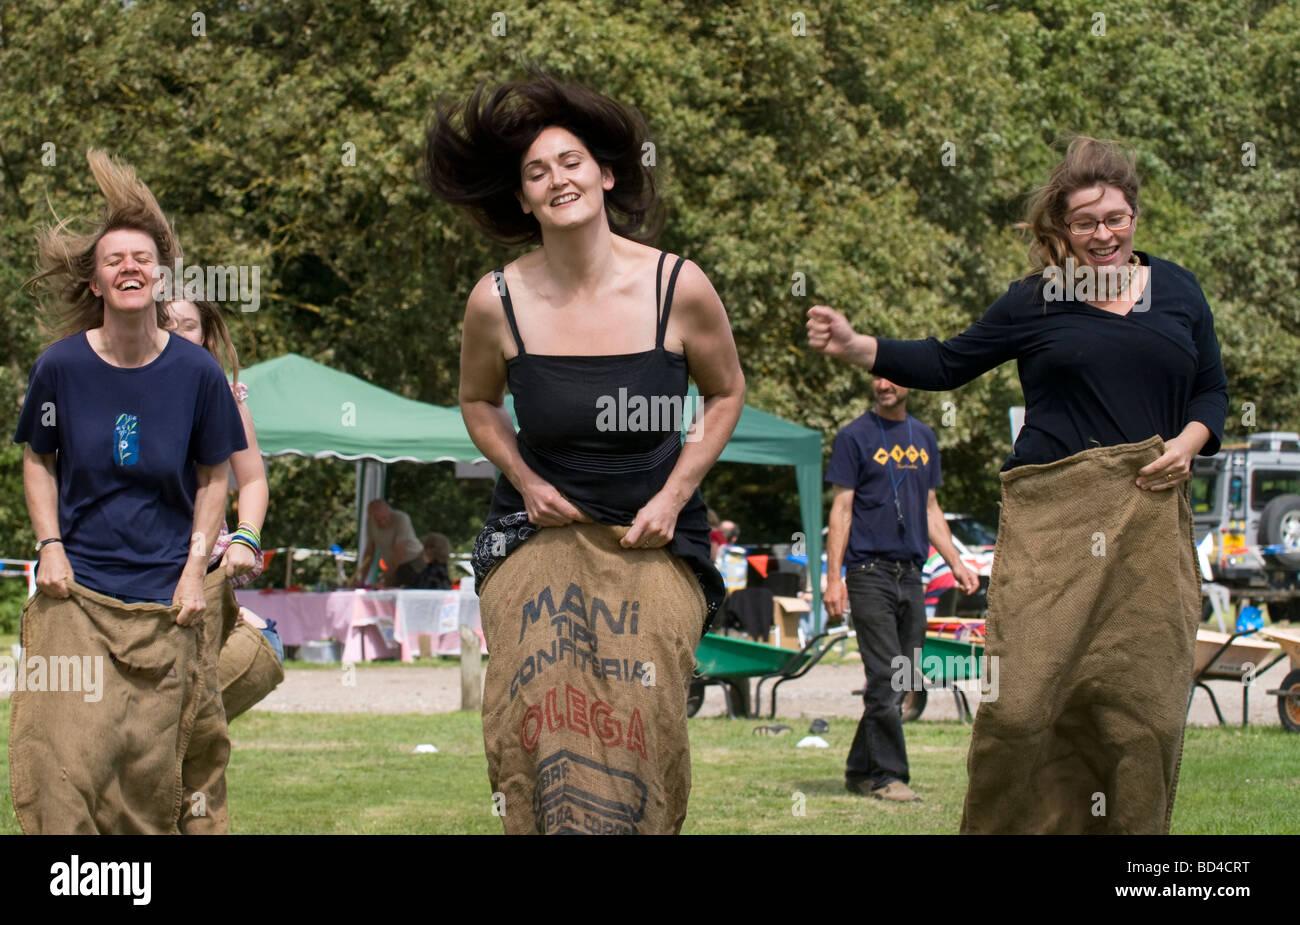 Women taking part in sack race at Oakhanger Village Show, Hampshire, UK. - Stock Image